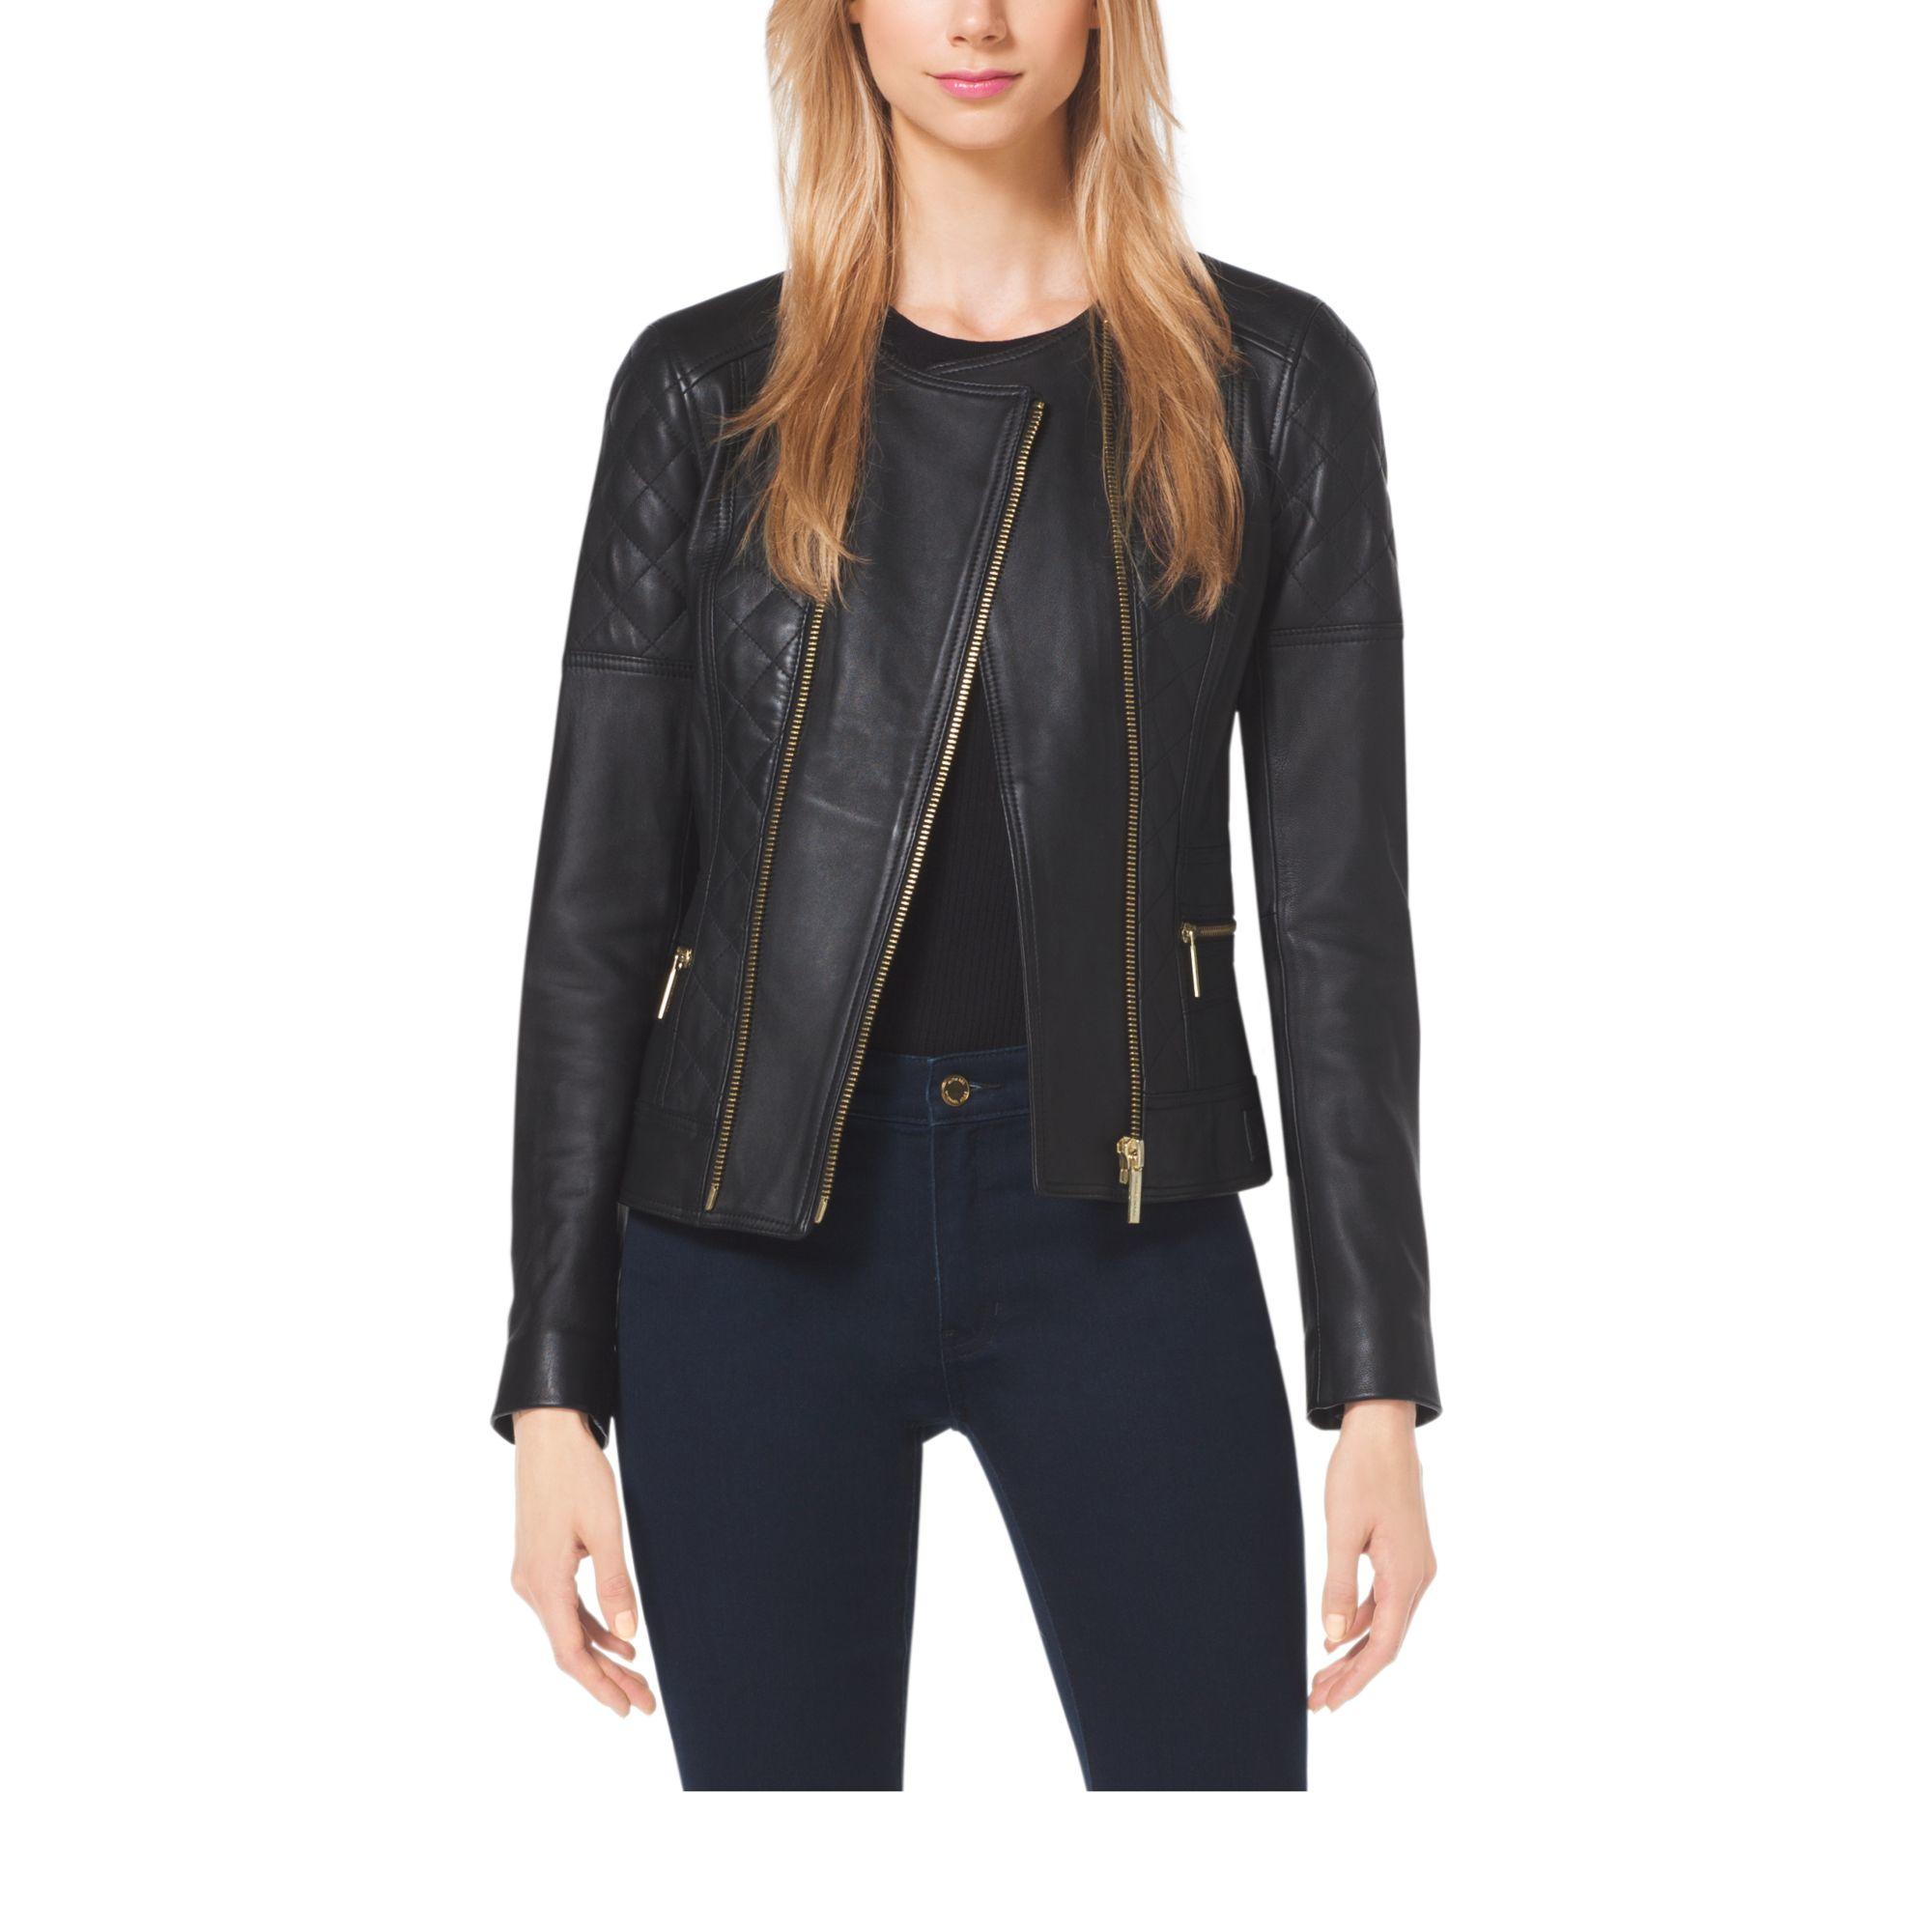 michael kors quilted leather moto jacket in black lyst. Black Bedroom Furniture Sets. Home Design Ideas